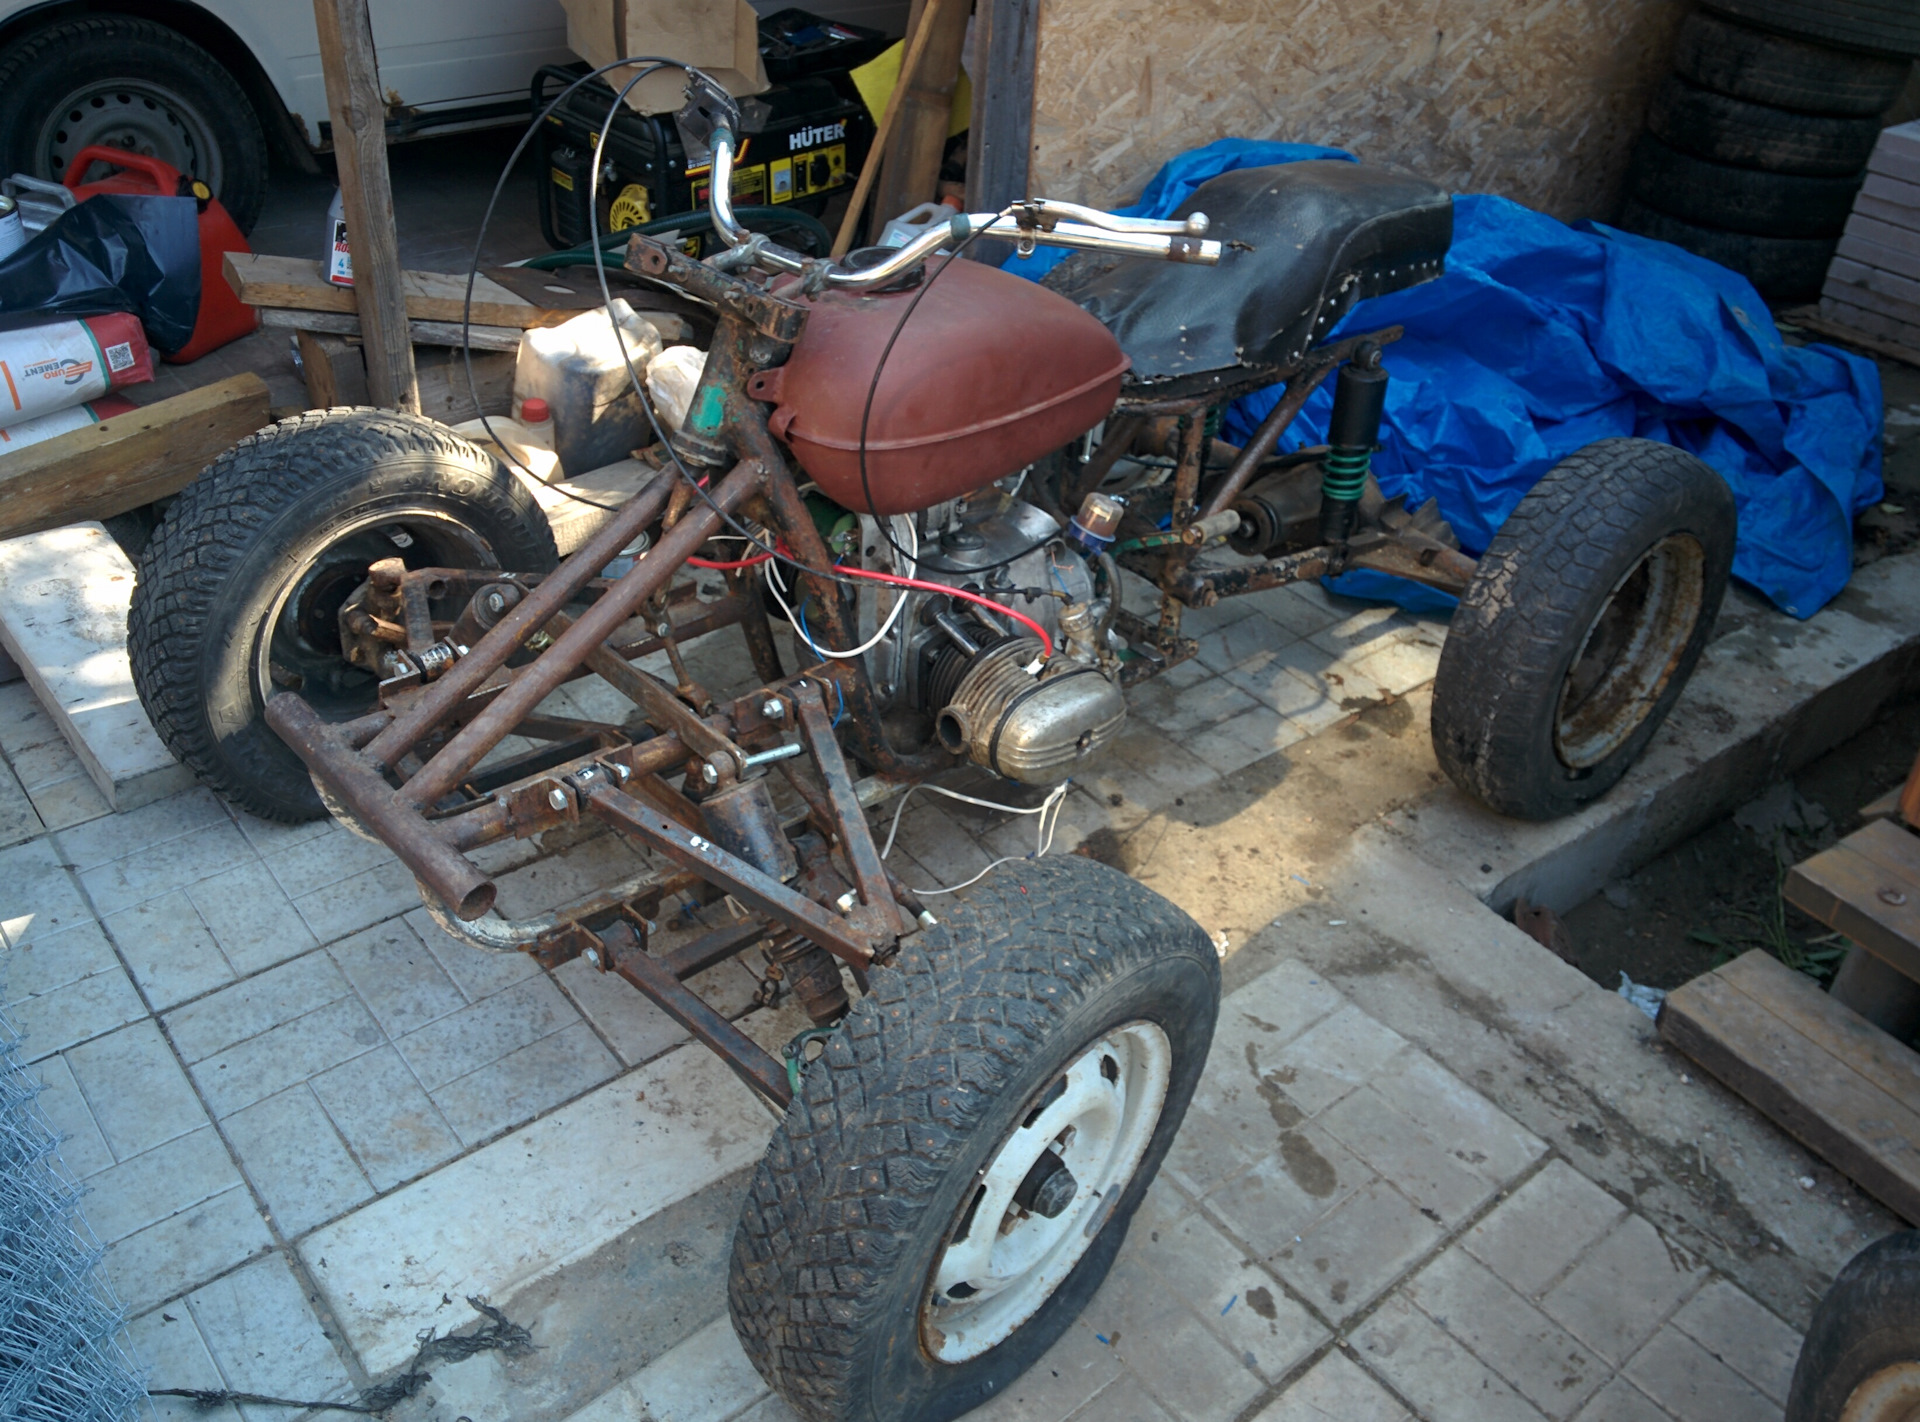 рынке фото переделанный мотоцикл урал под квадроцикл картинки тегом